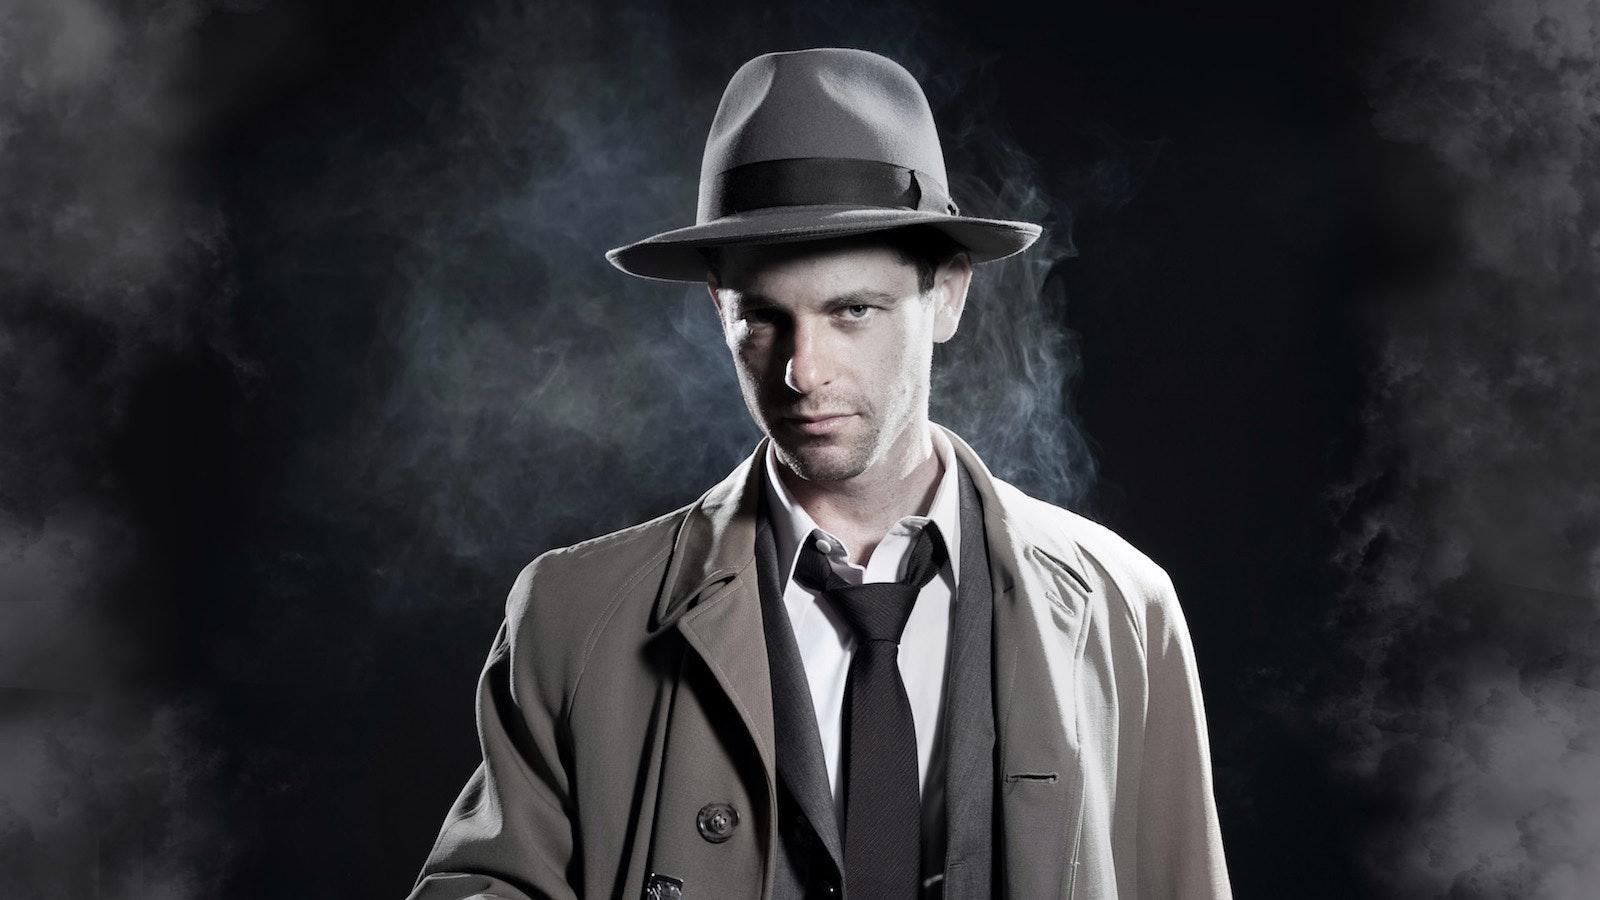 6 Quick Dick Tricks: A Dirk Darrow Investigation